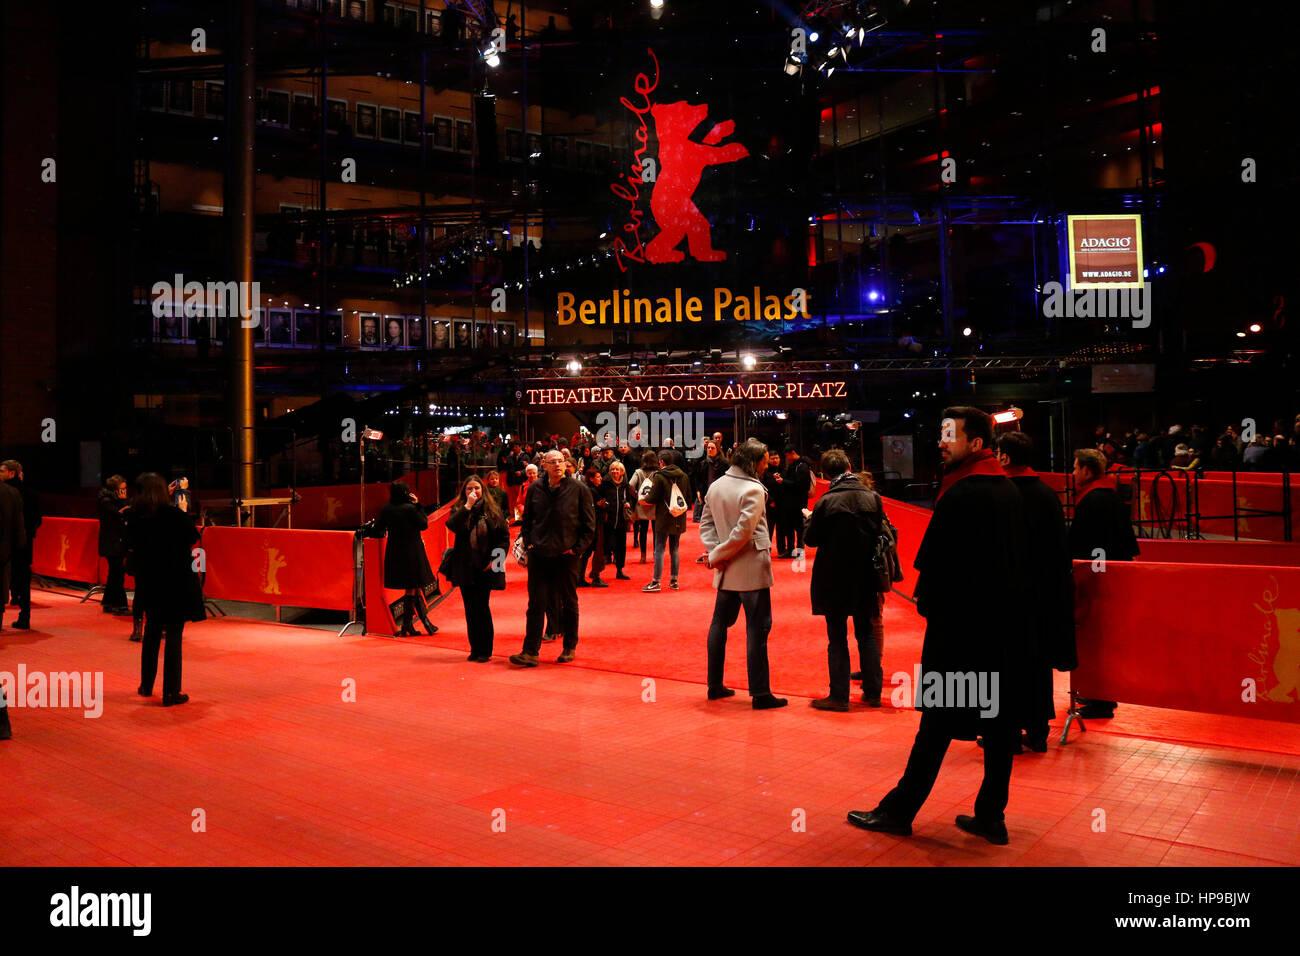 Berlinale-Palast, Roter Teppich - Impressionen - Berlinale 2017, 16. Februar 2017, Berlin. Stockbild